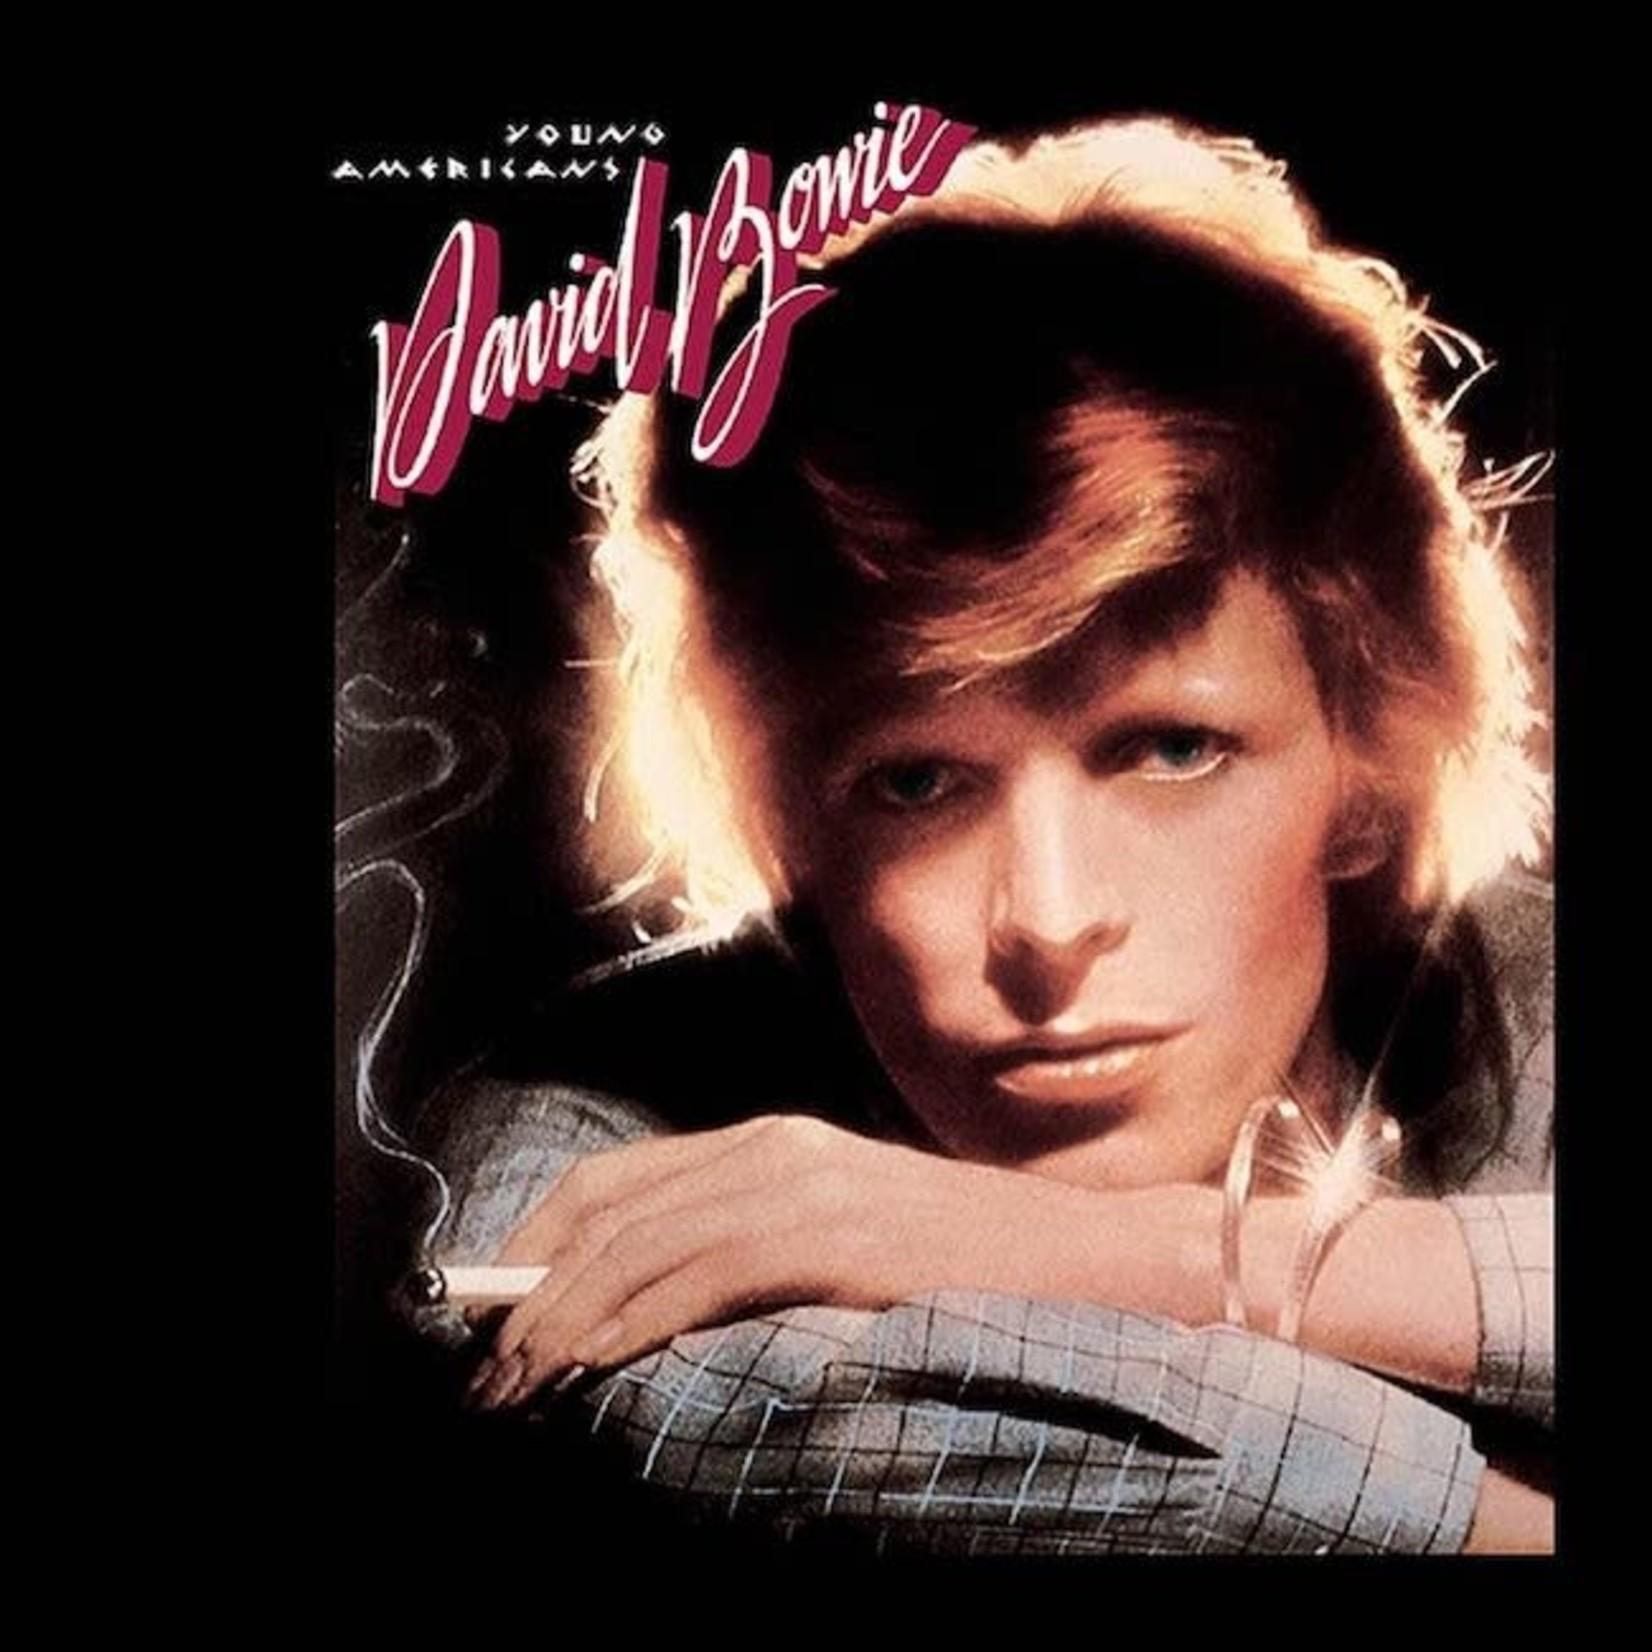 [Vintage] Bowie, David: Young Americans